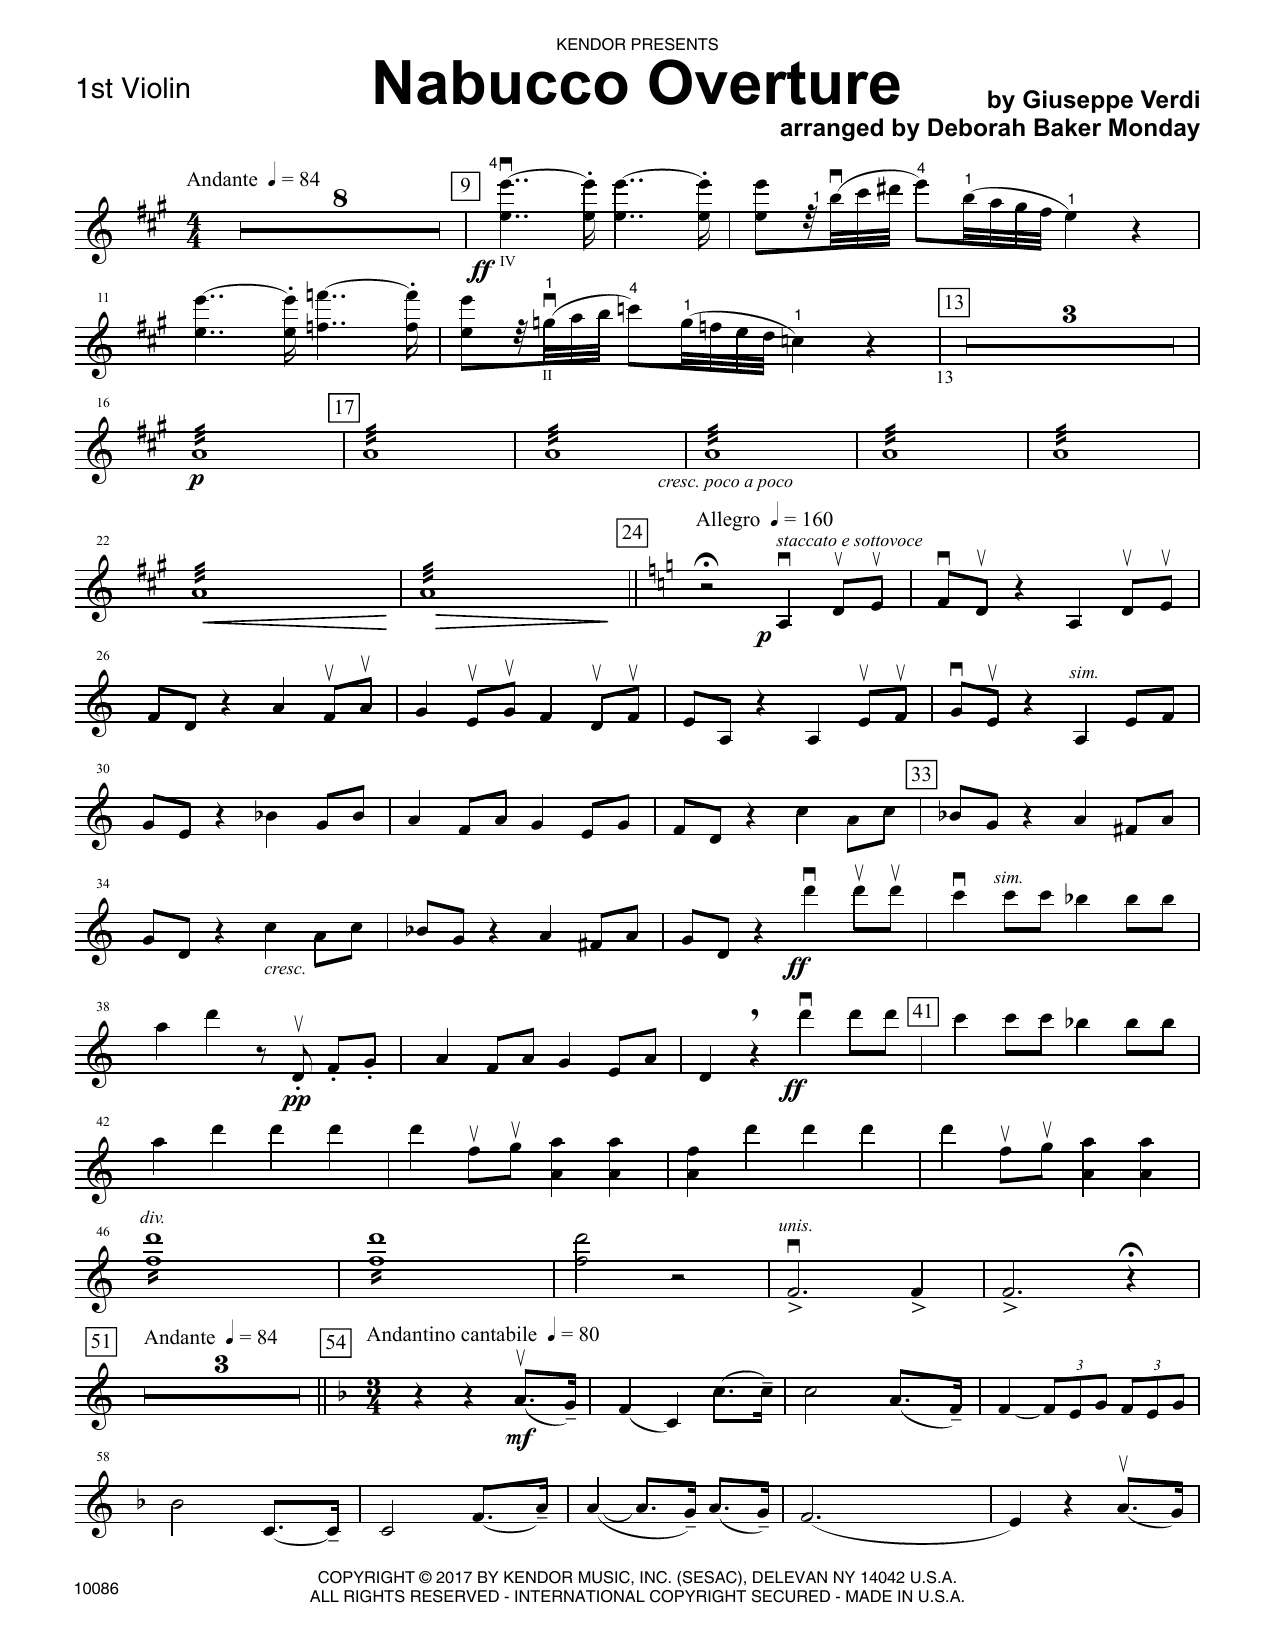 Nabucco Overture - 1st Violin